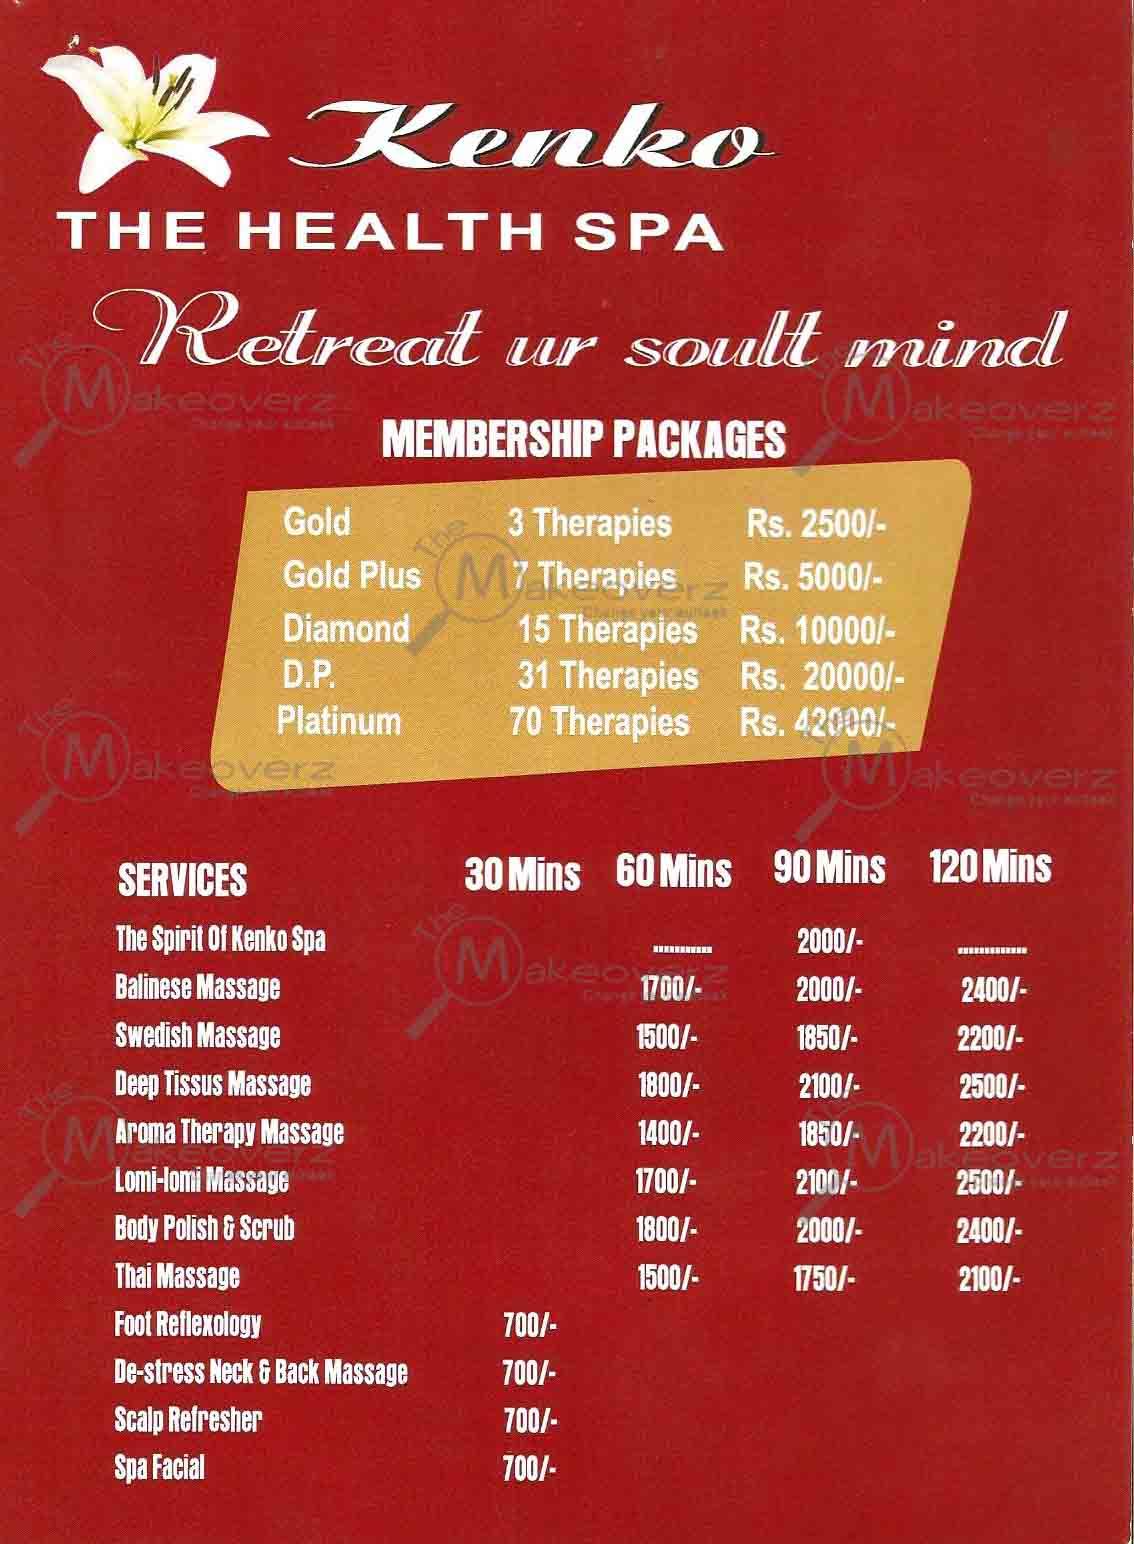 Kenko The Health Spa - Palam Vihar - rate list